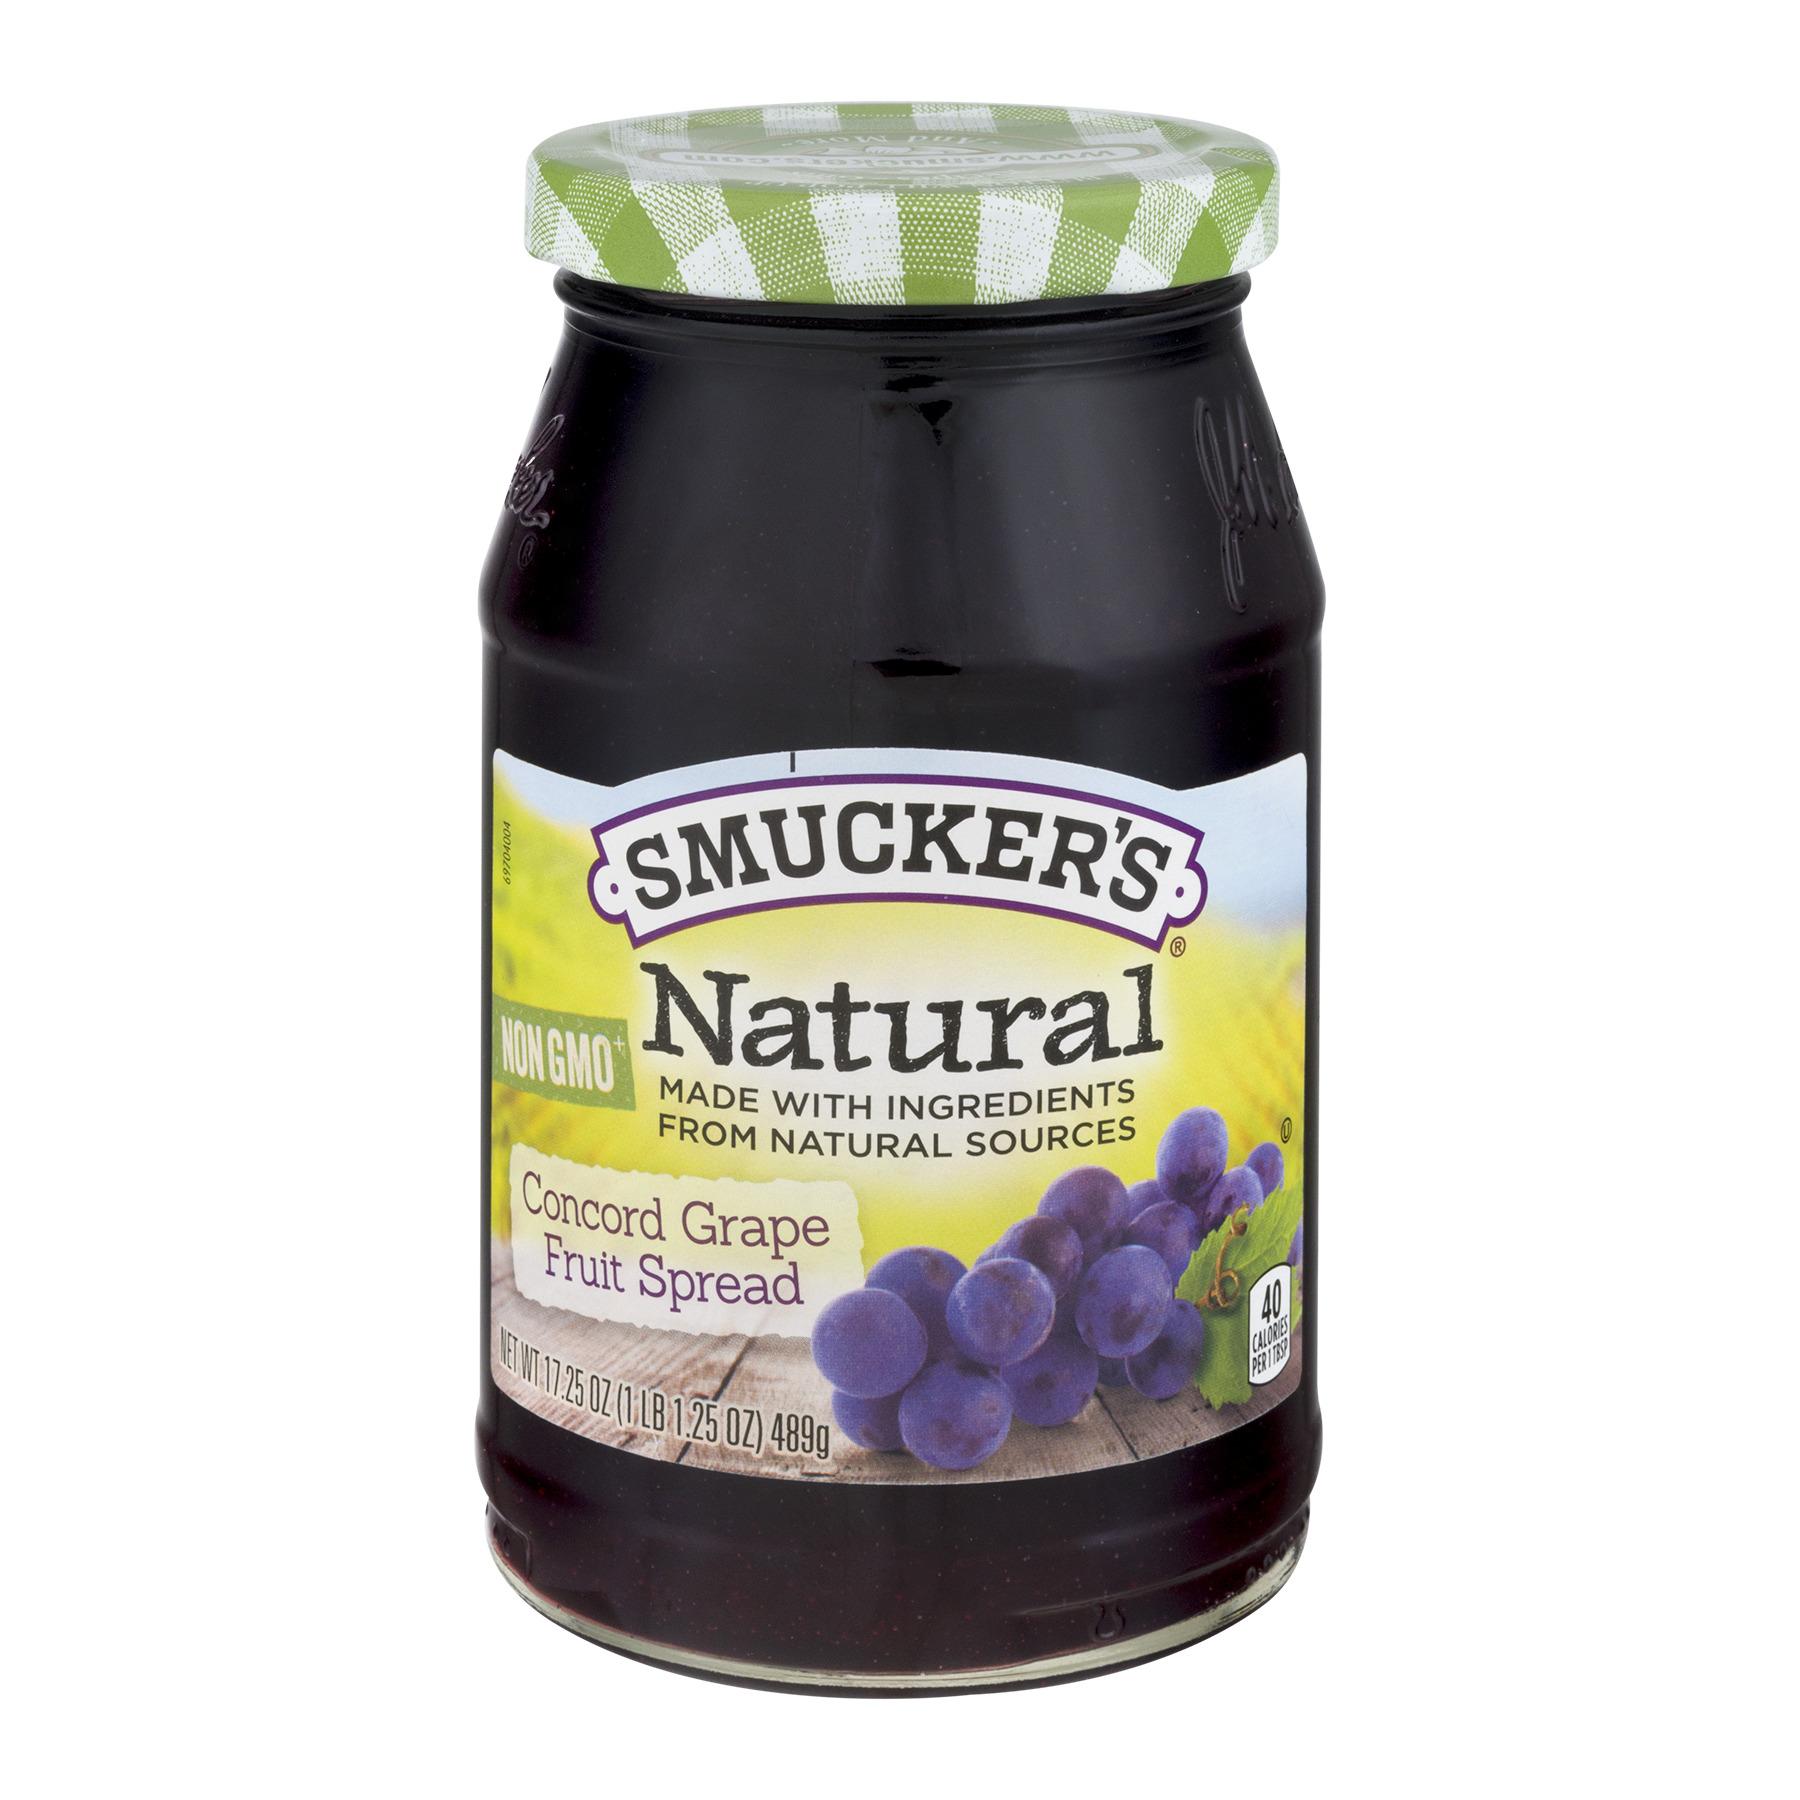 Smucker's Natural Fruit Spread Concord Grape, 17.25 OZ